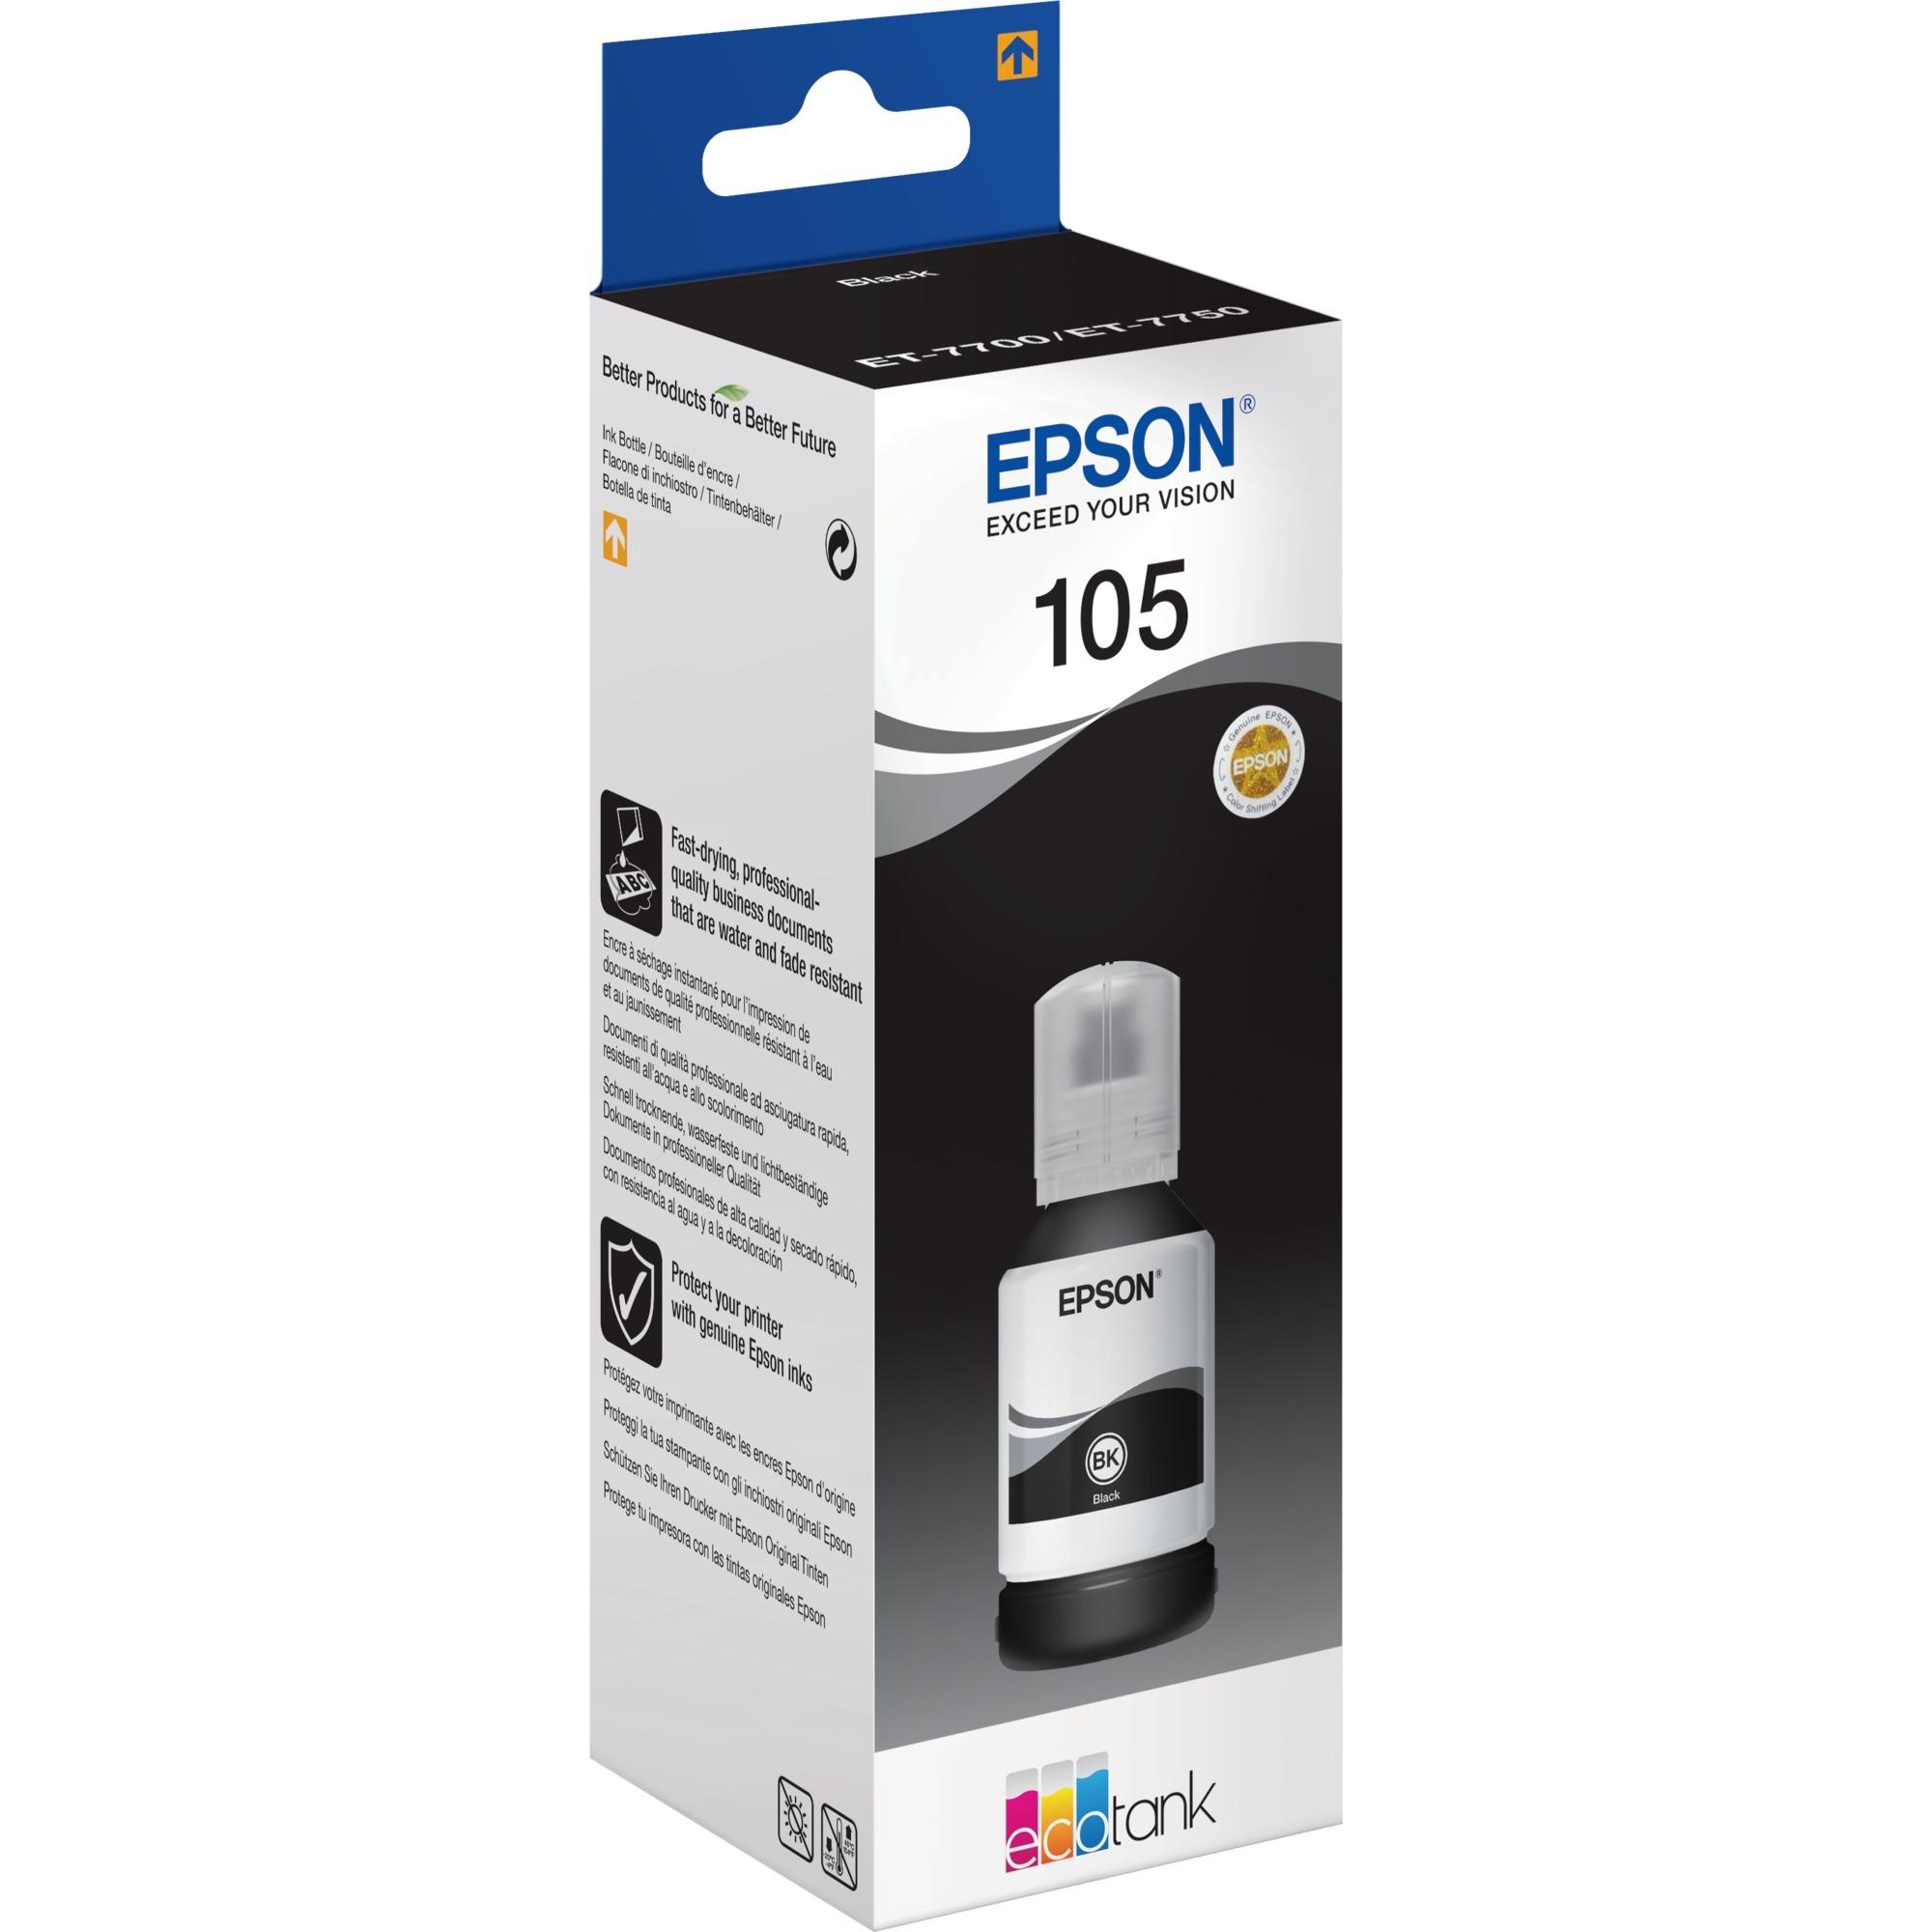 105 EcoTank Black ink bottle cartucho de tinta